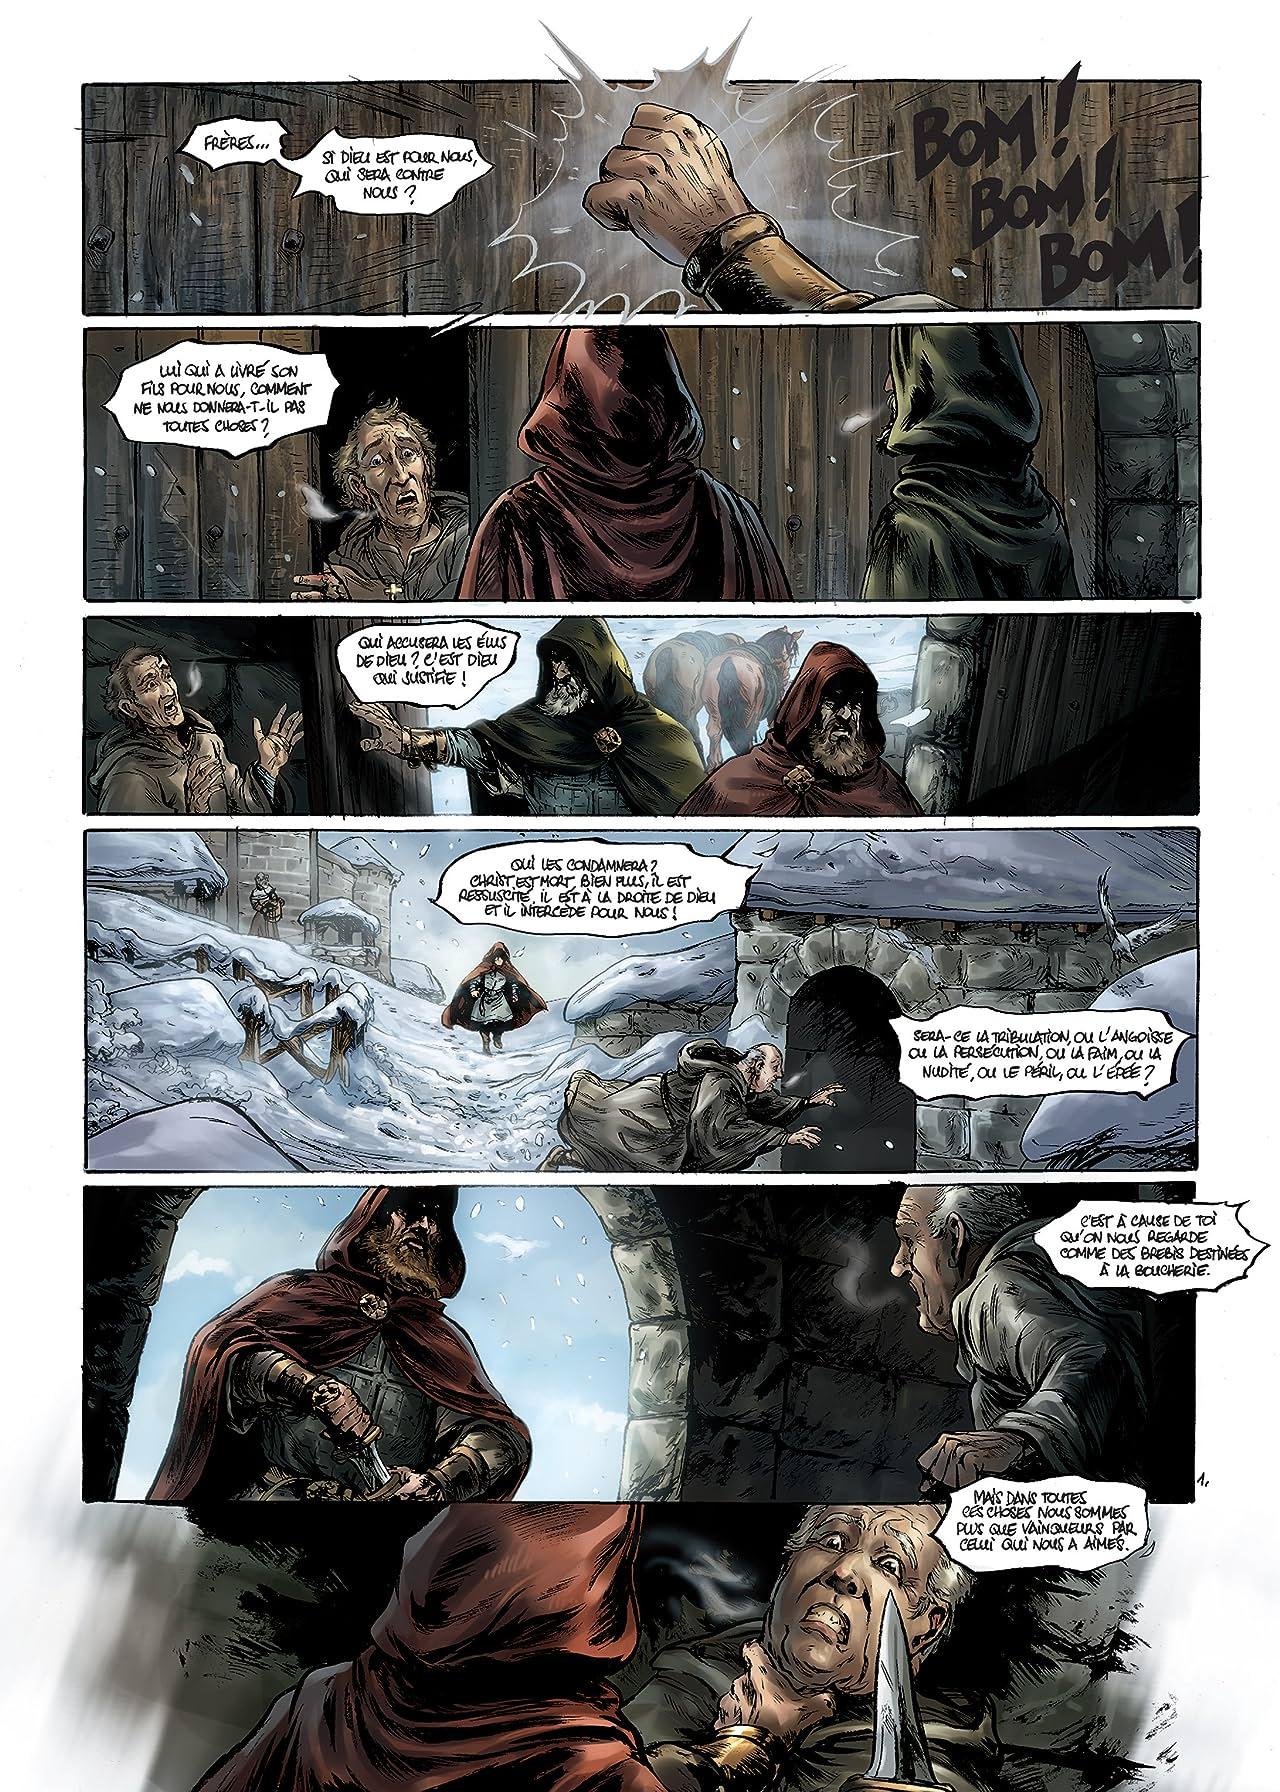 Durandal Vol. 3: La marche de Bretagne partie III